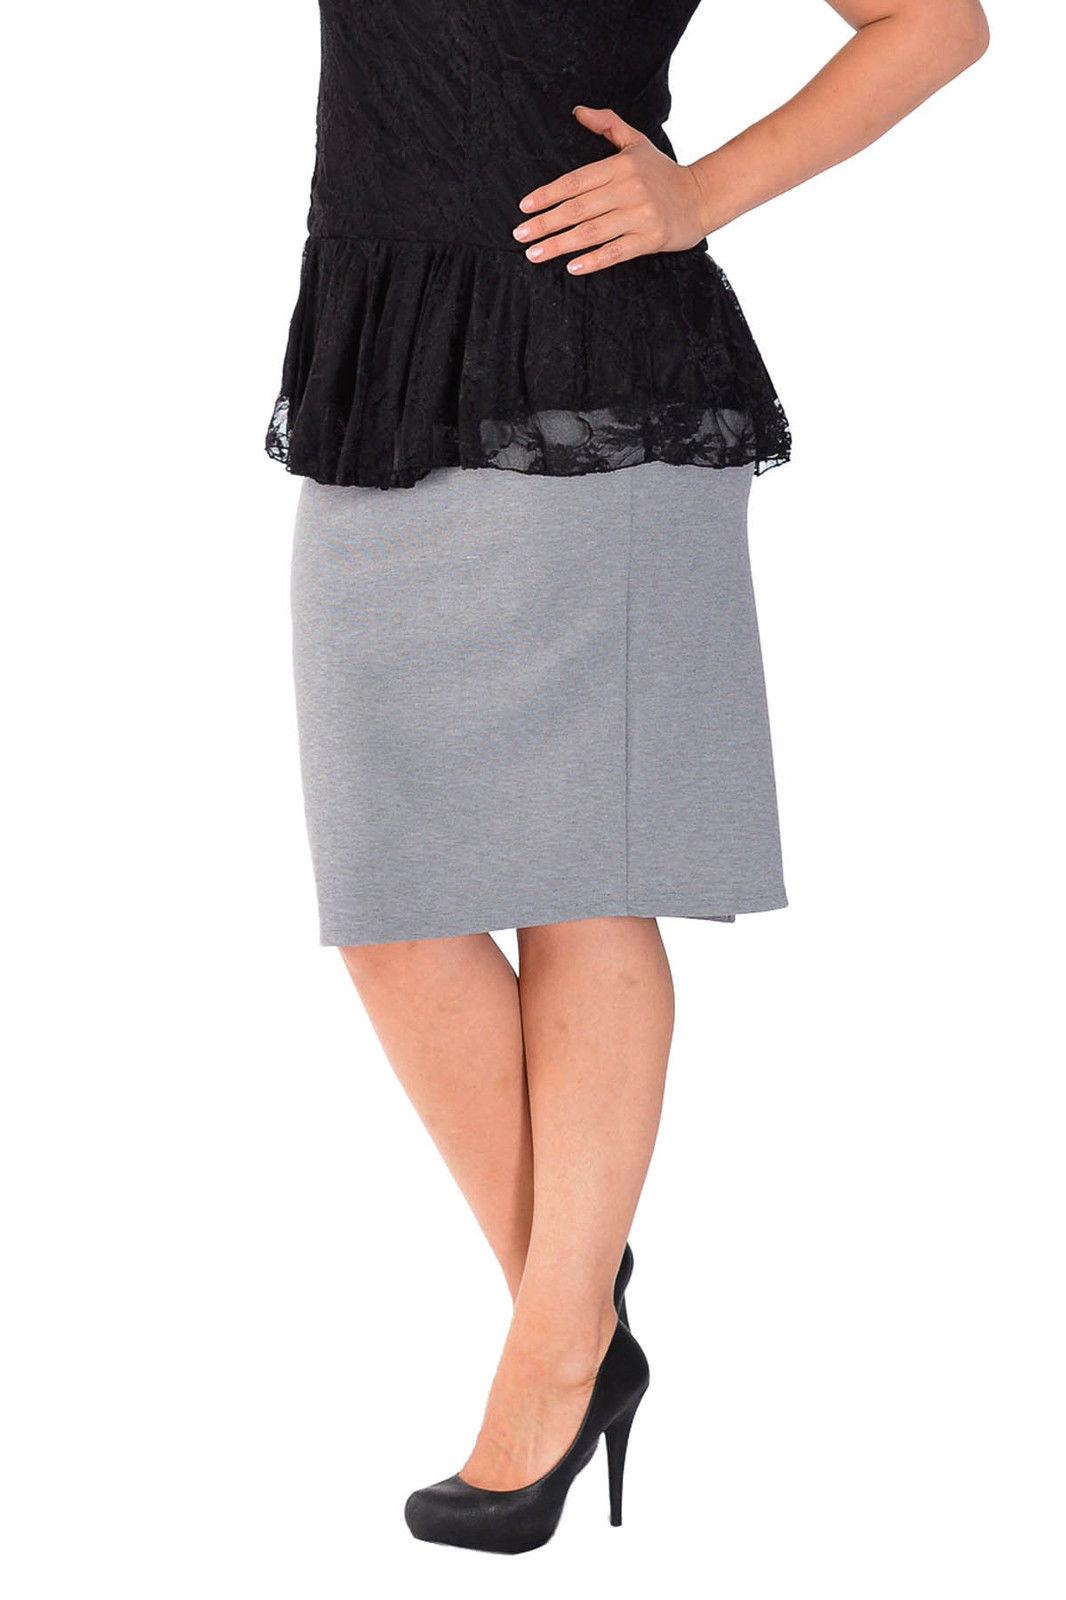 new womens plus size skirt pencil bodycon stretch elastic